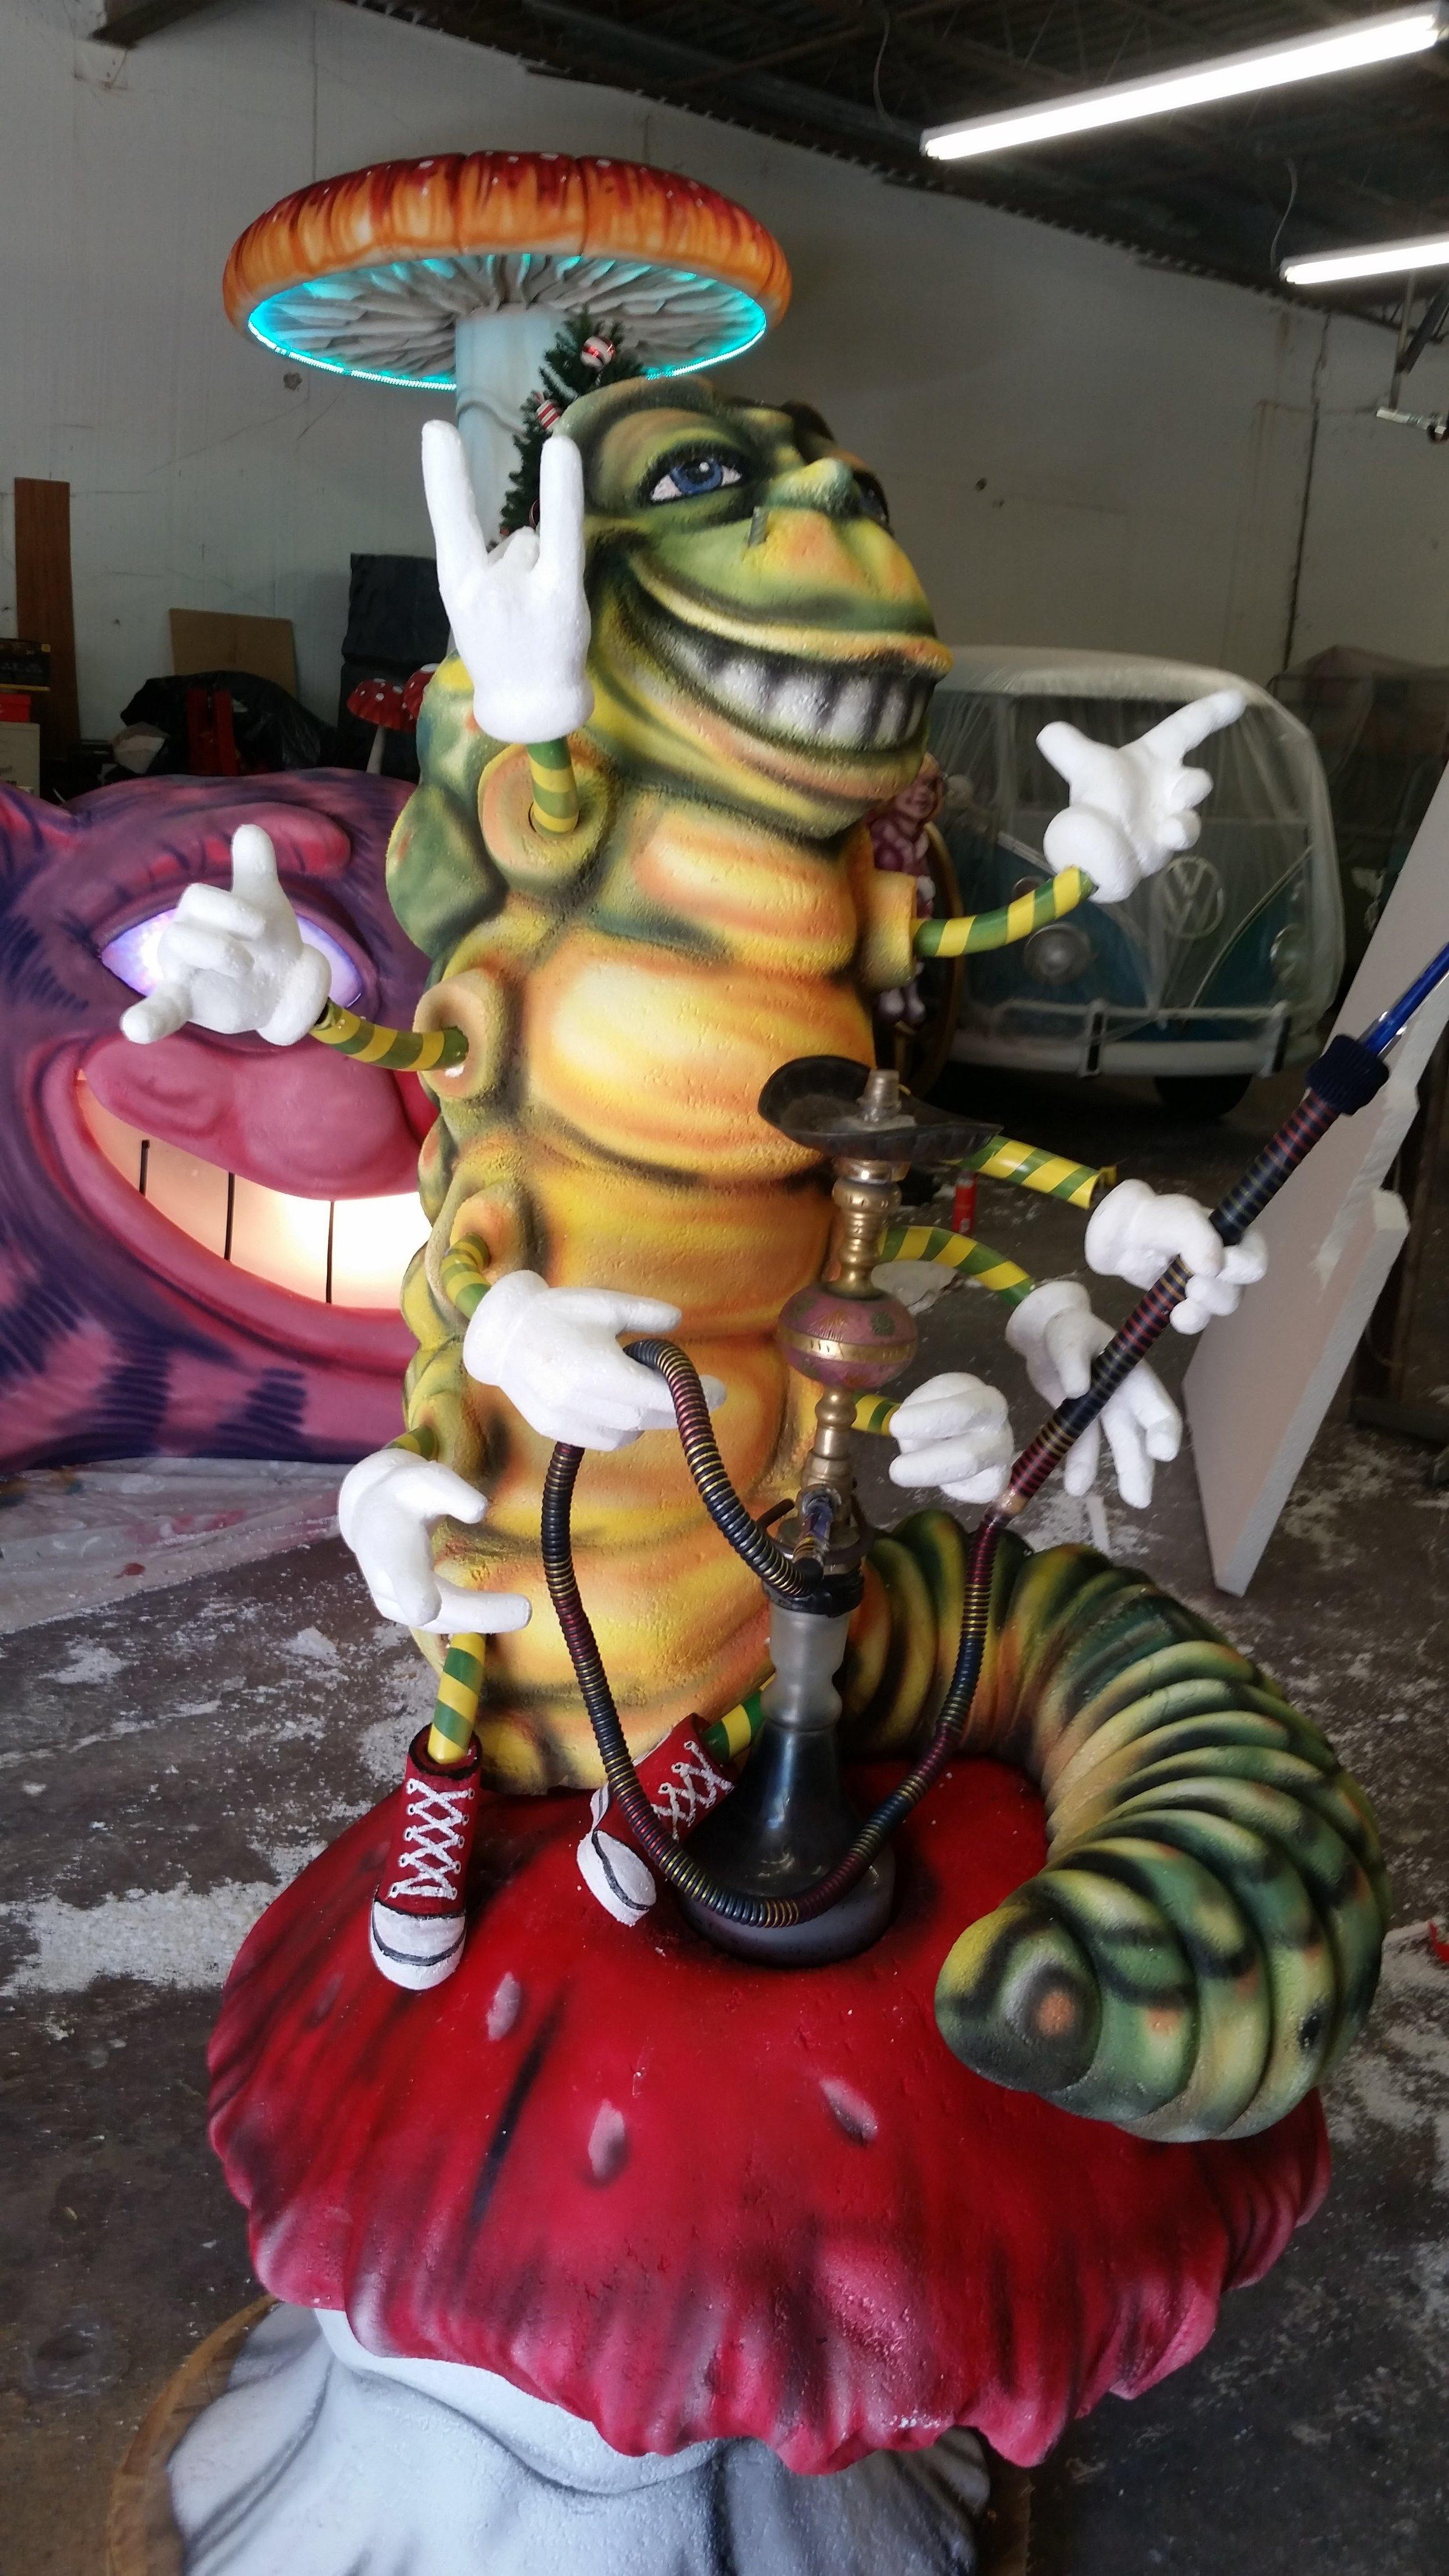 absolem-figurine-prop-rental.jpg